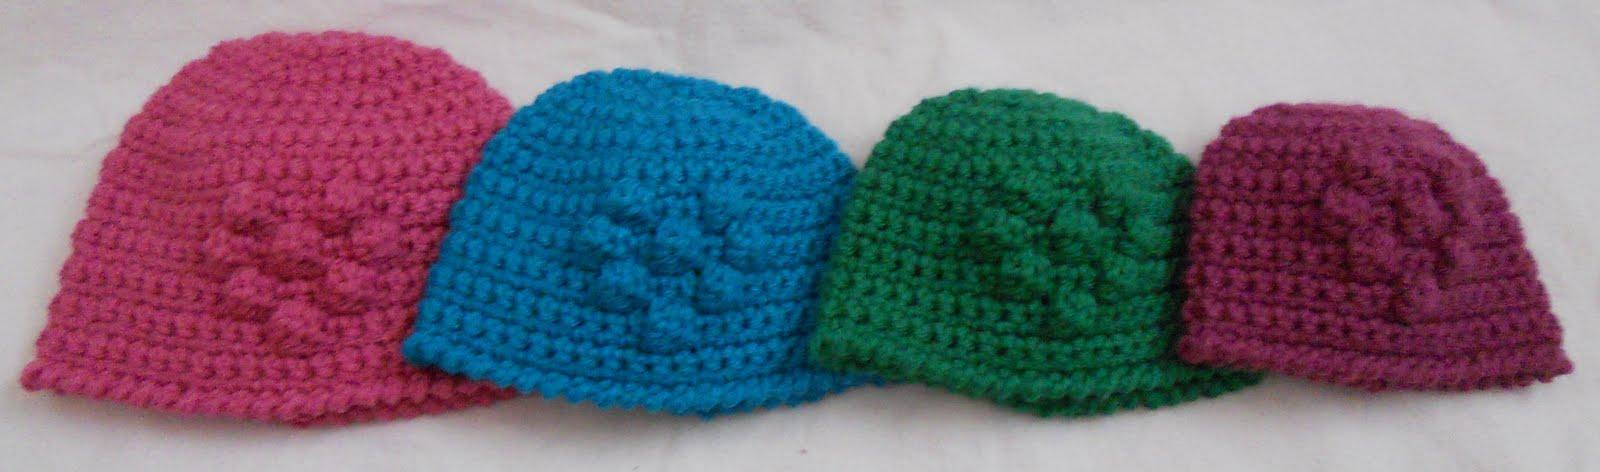 Free Crochet Pattern Bobble Hat : Crafty Woman Creations: Free Baby Heart Bobble Beanie Pattern